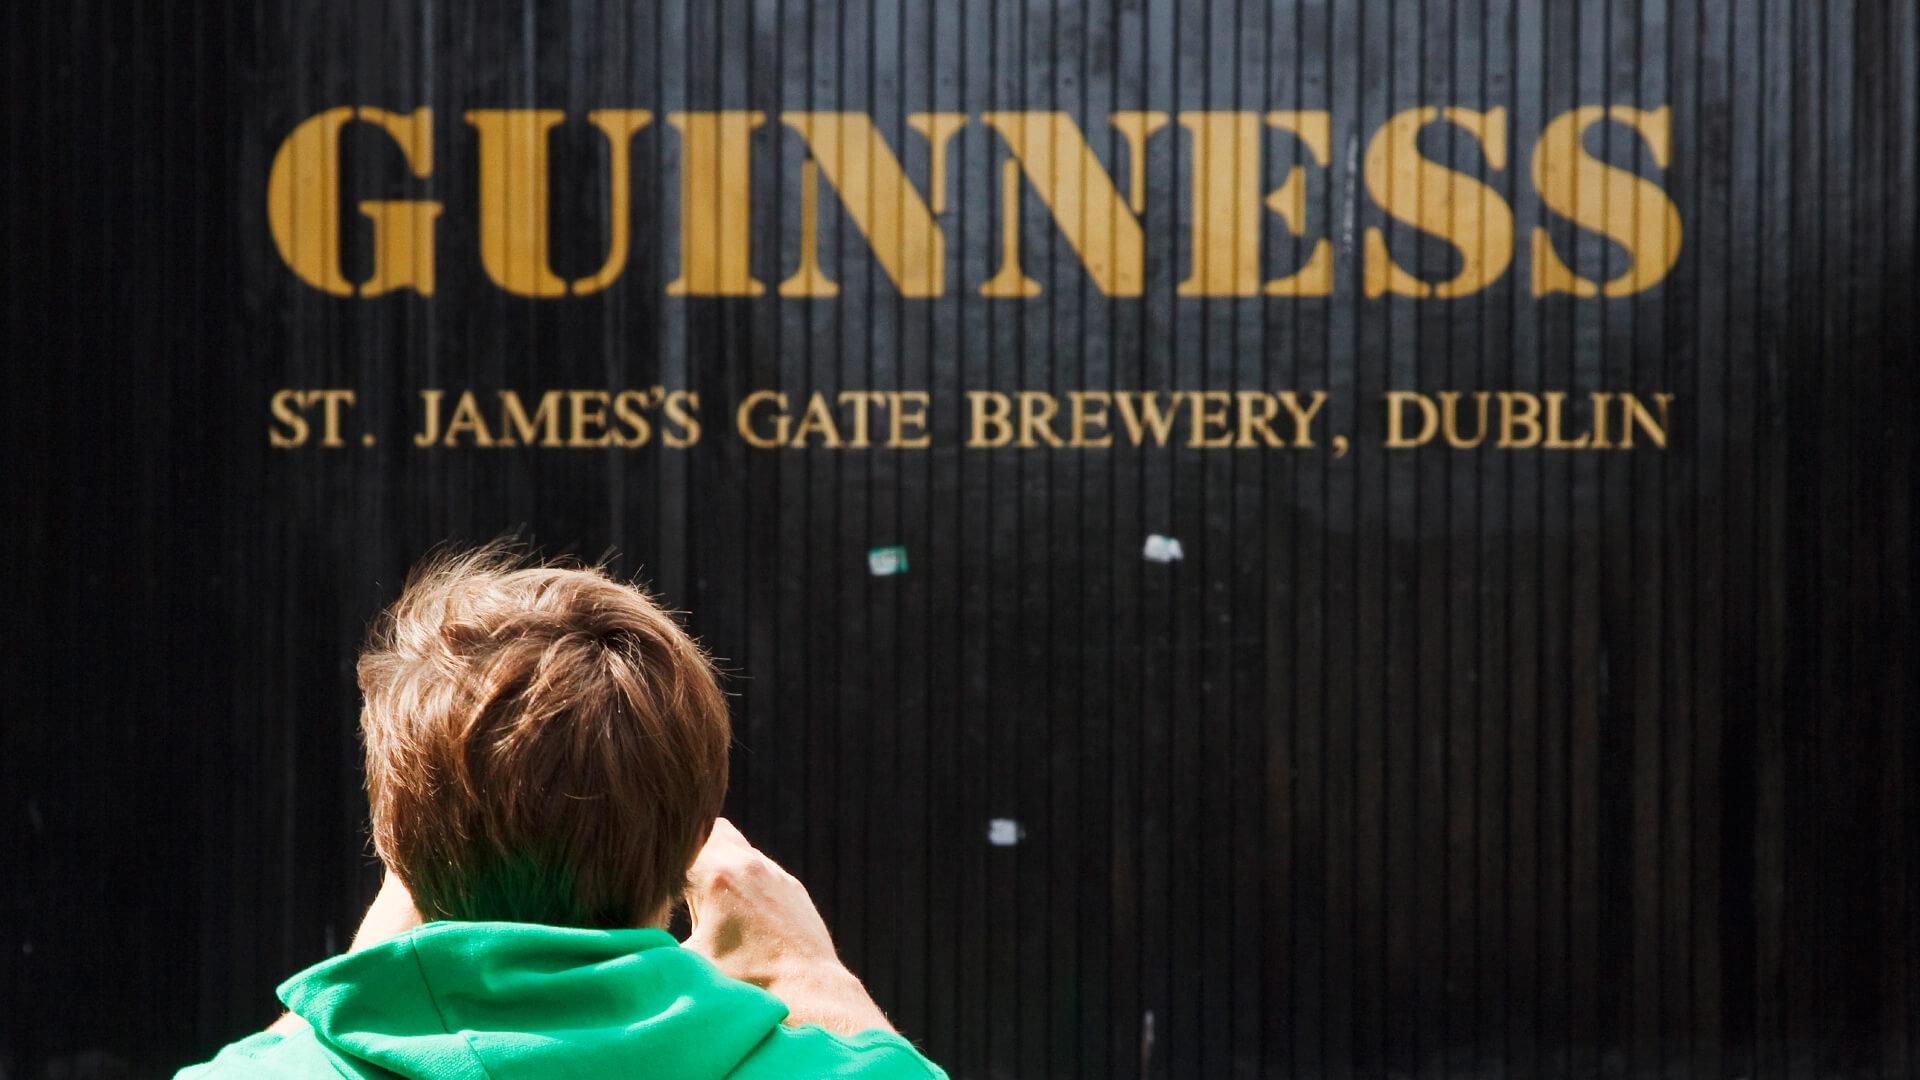 http://Guinness%20St.%20James's%20Gate%20Brewery,%20Dublin